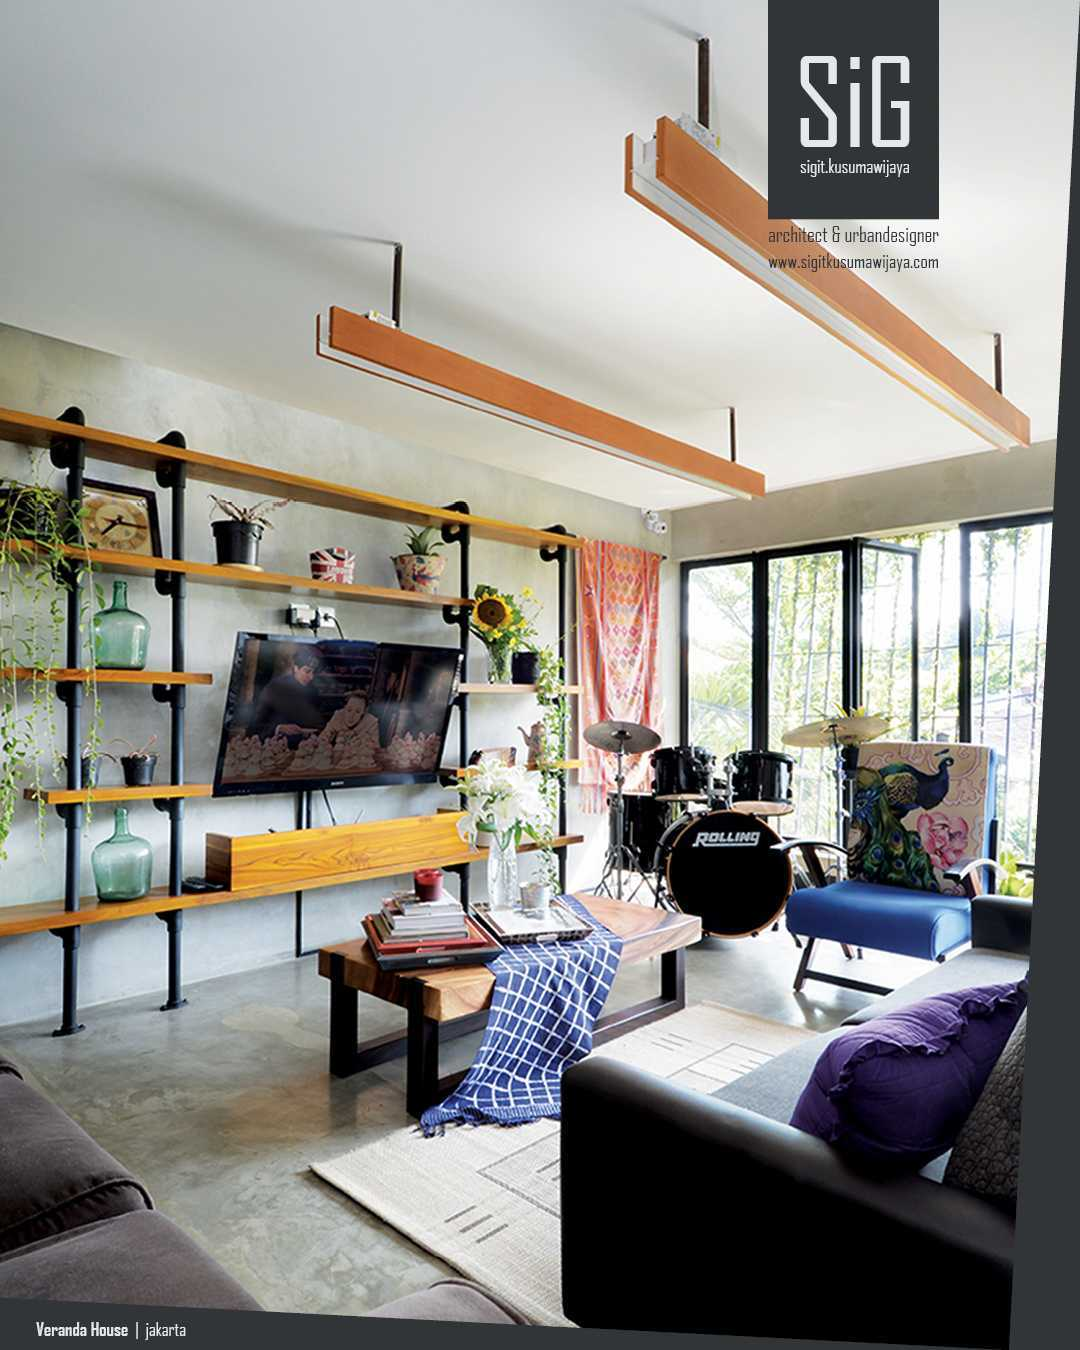 Sigit.kusumawijaya | Architect & Urbandesigner Rumah Beranda - Green Boarding House Cipete, South Jakarta, Indonesia Cipete, South Jakarta, Indonesia Sigitkusumawijaya-Architect-Urbandesigner-Rumah-Beranda-Green-Boarding-House Industrial  55003